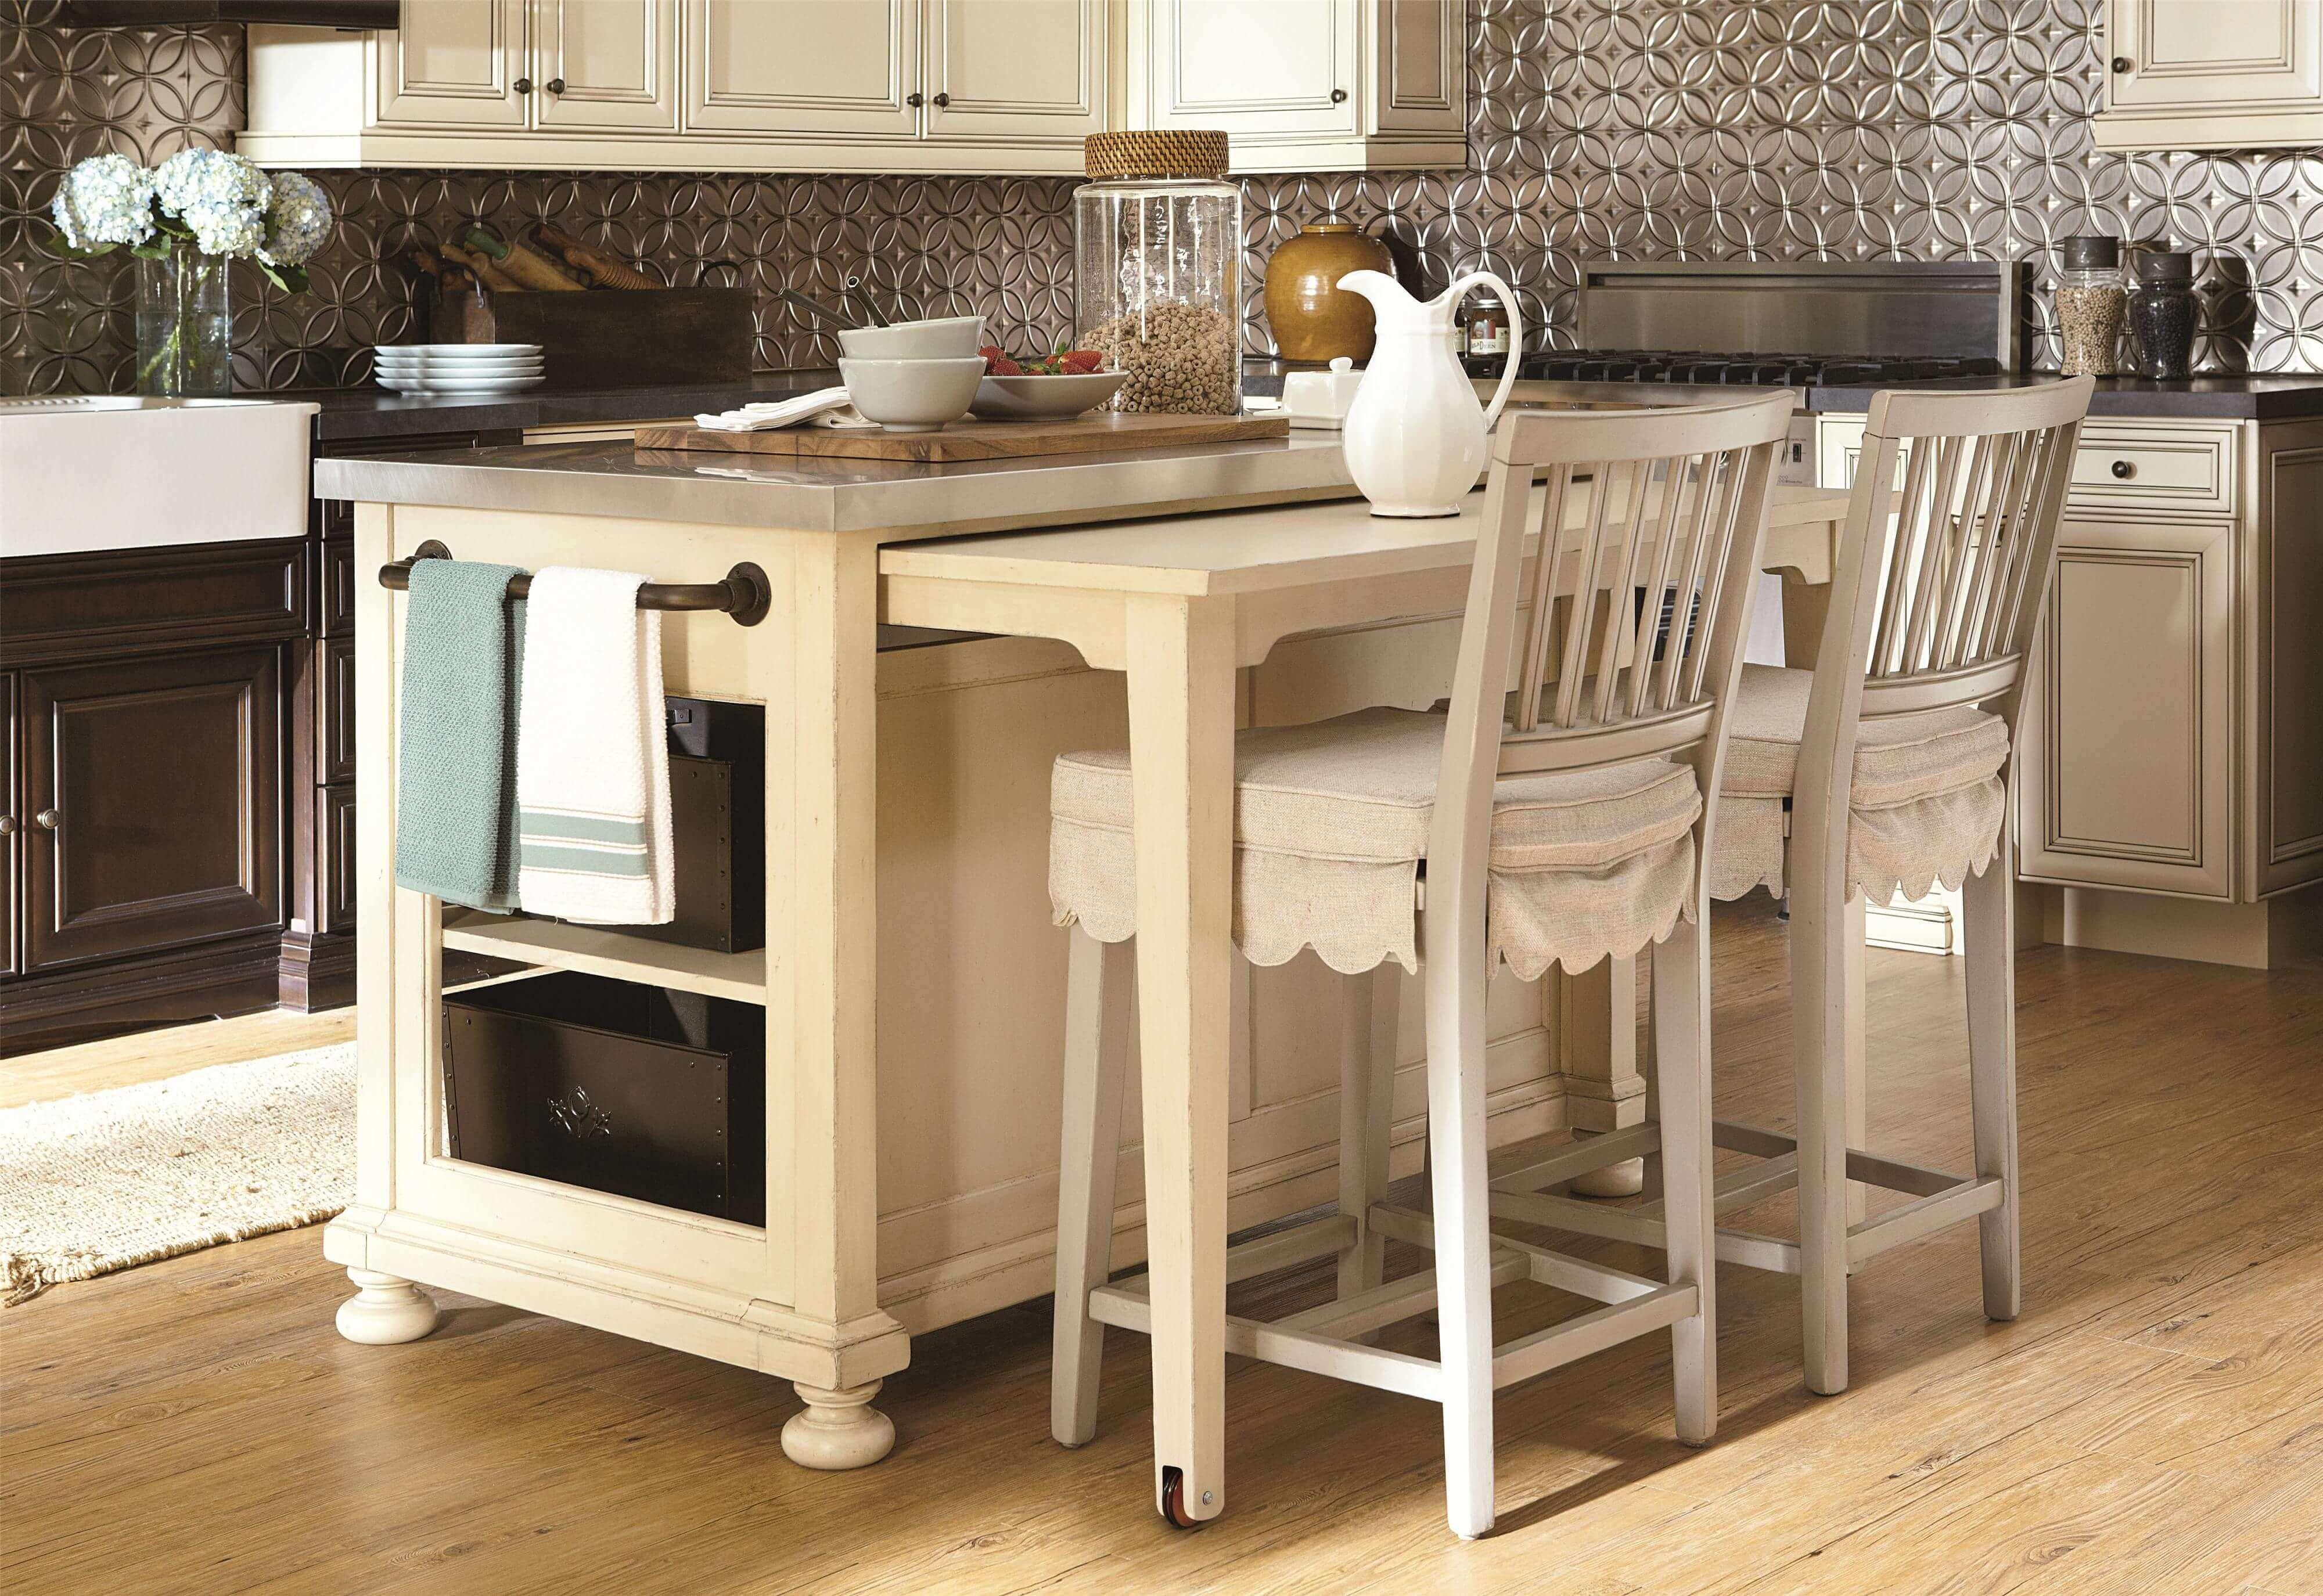 68 Deluxe Custom Kitchen Island Ideas Jaw Dropping Designs Portable Kitchen Island Home Kitchens Ikea Kitchen Island